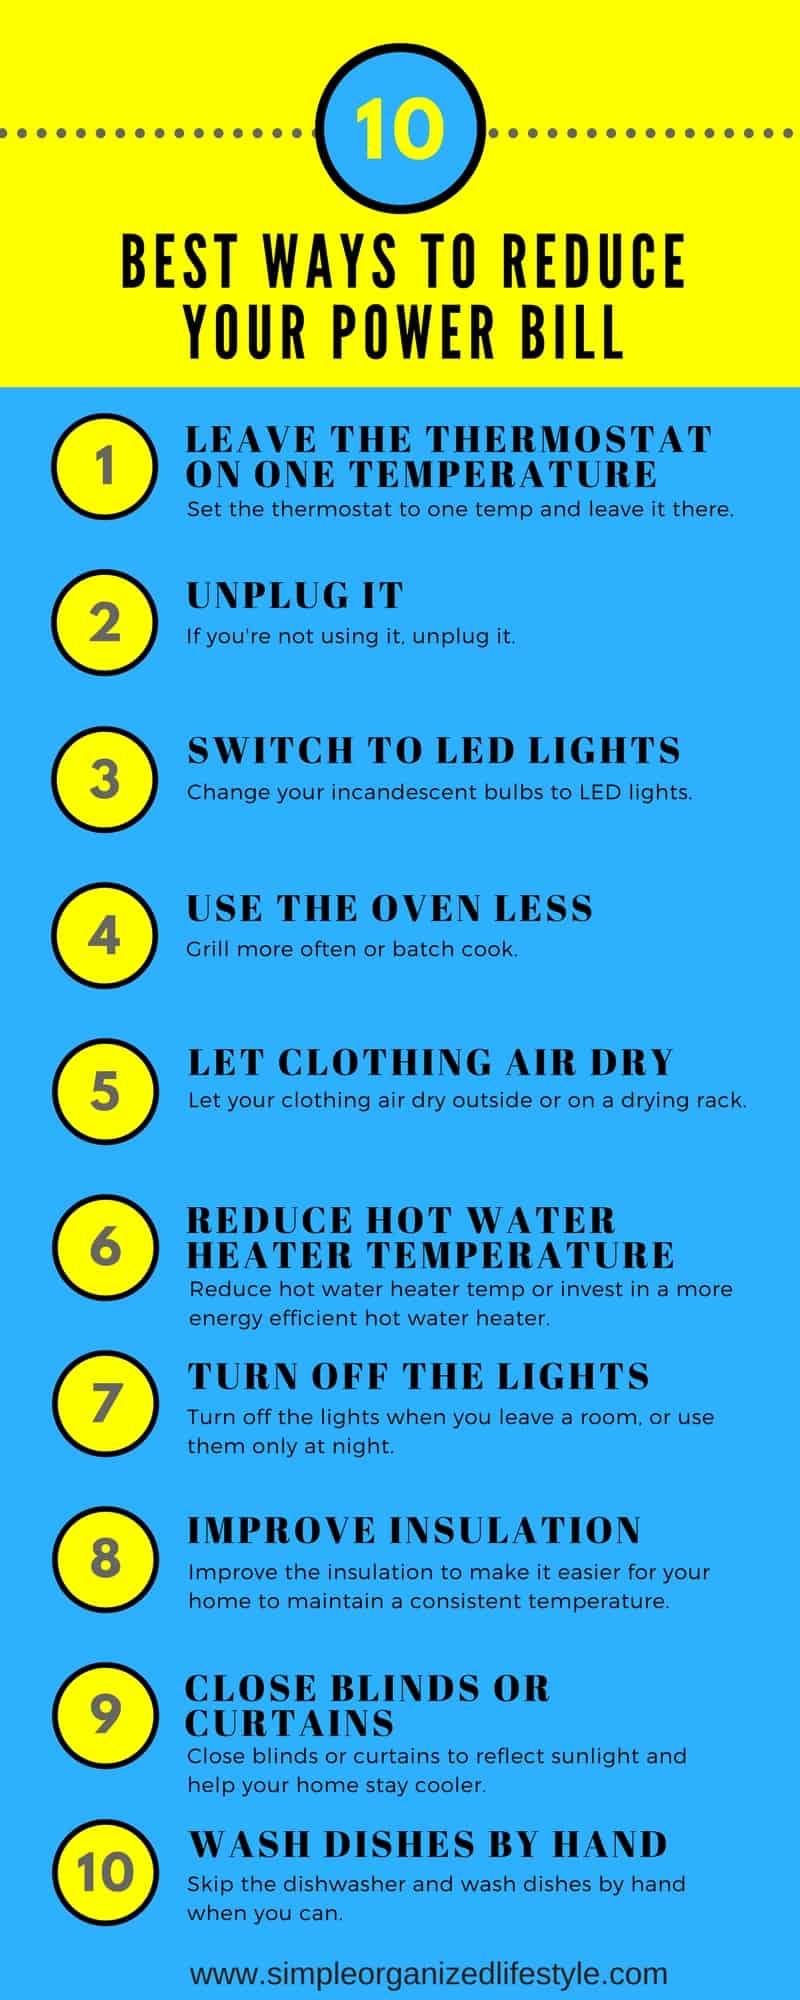 10 Best Ways to Reduce Your Power Bill